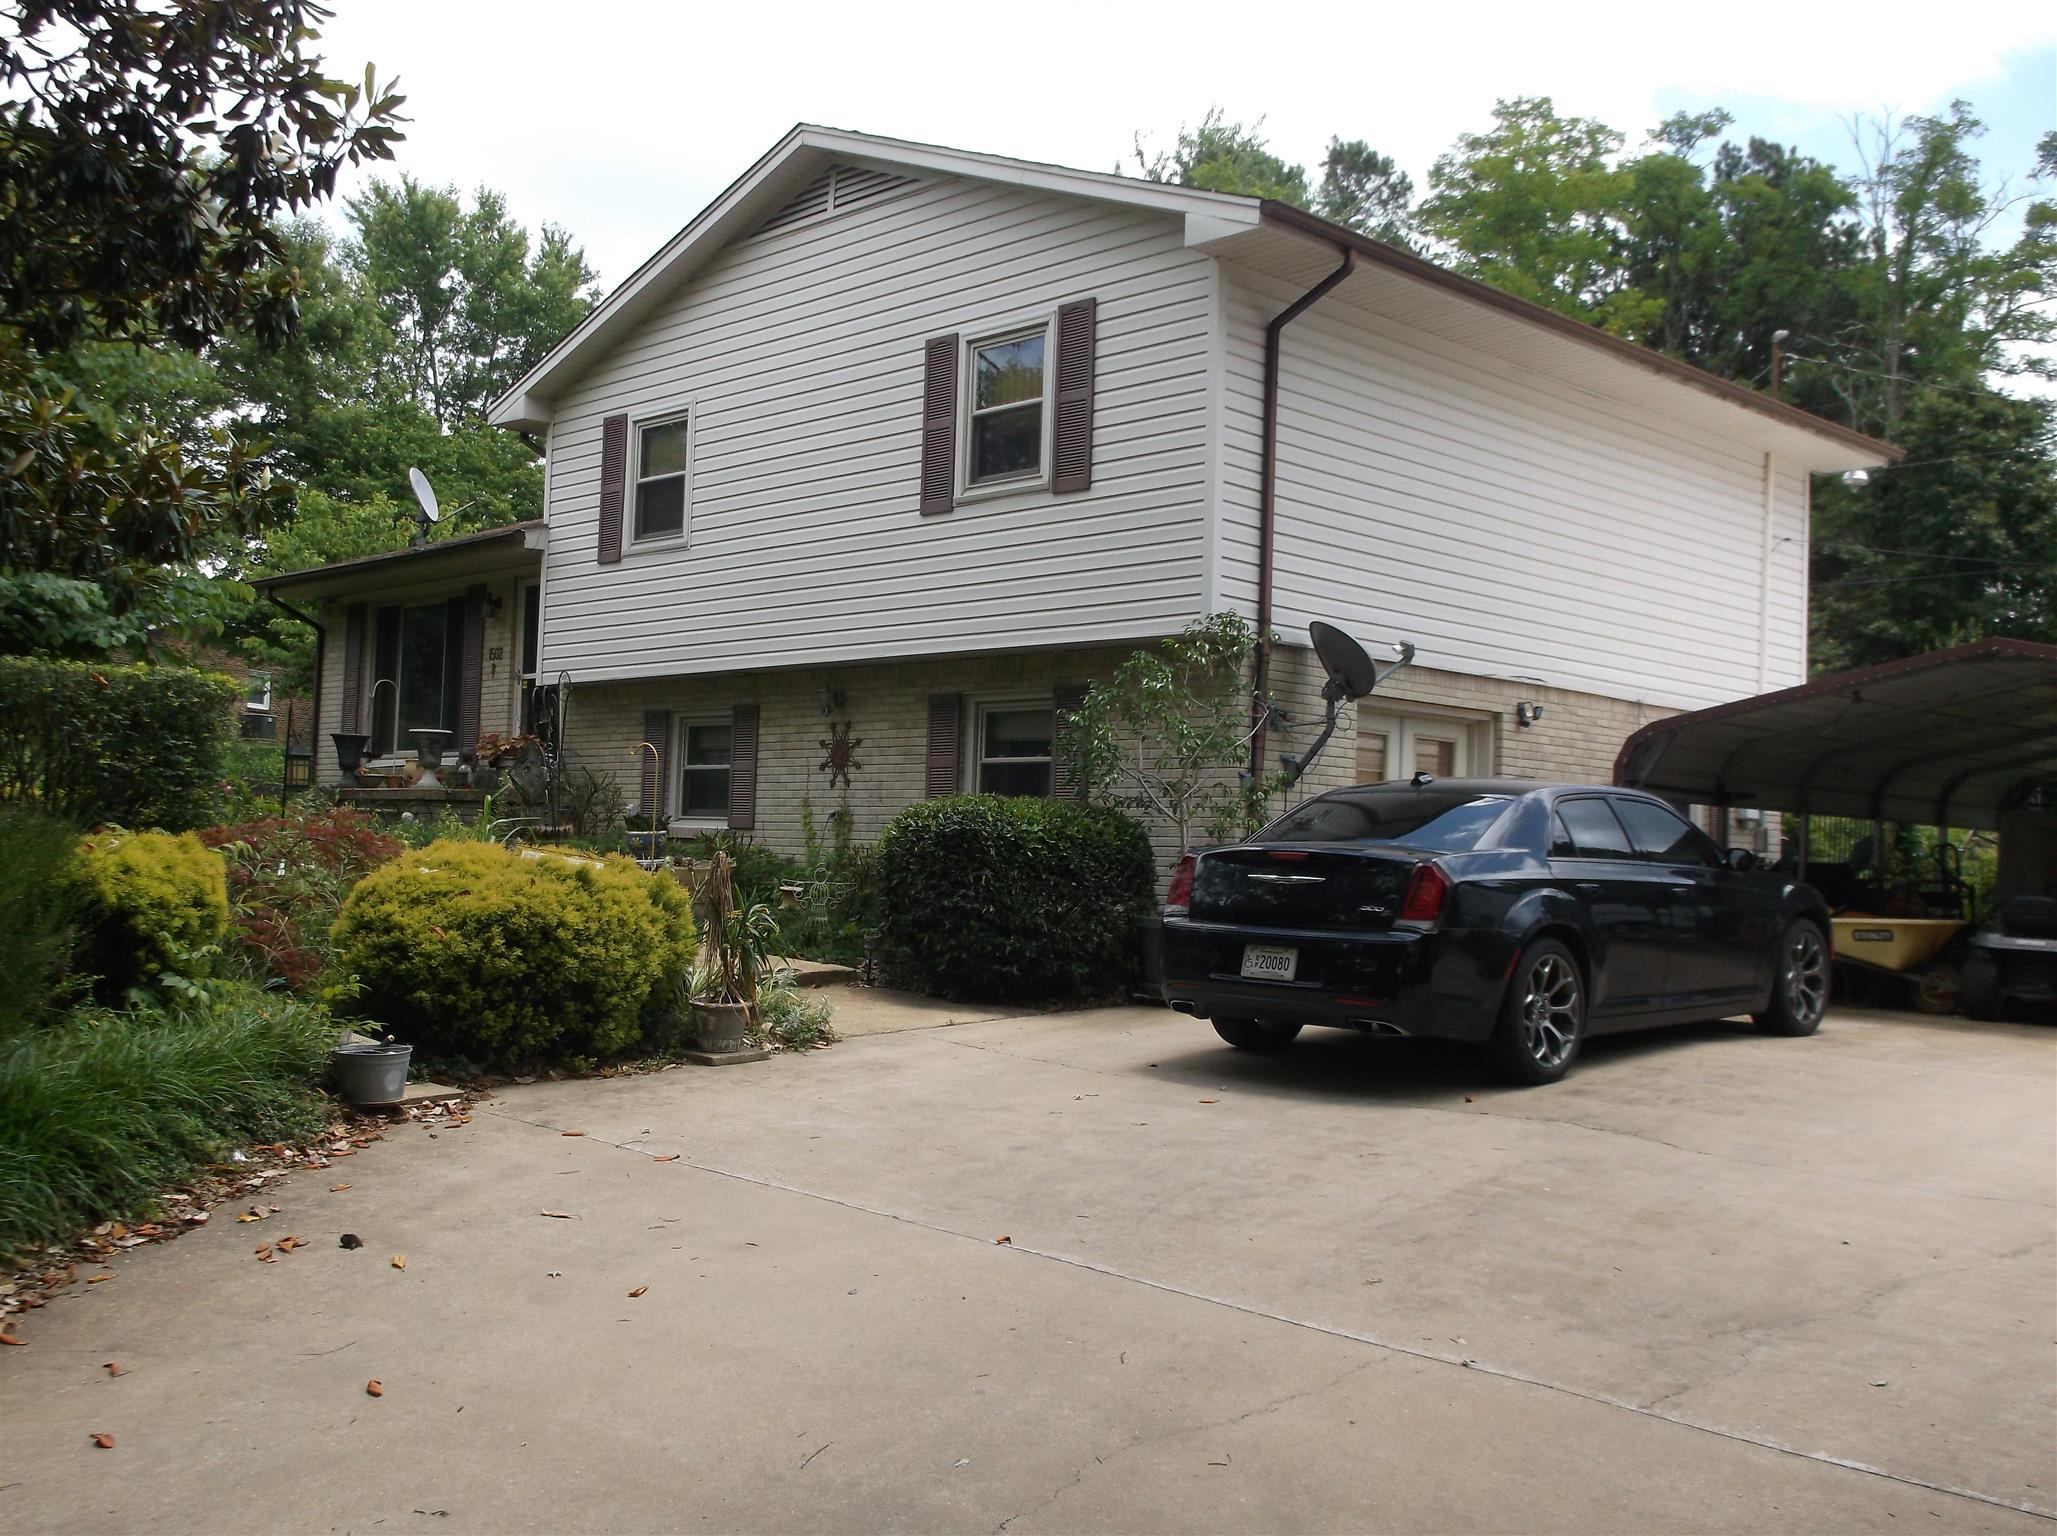 1502 Hilltop Dr, Lawrenceburg, TN 38464 - Lawrenceburg, TN real estate listing